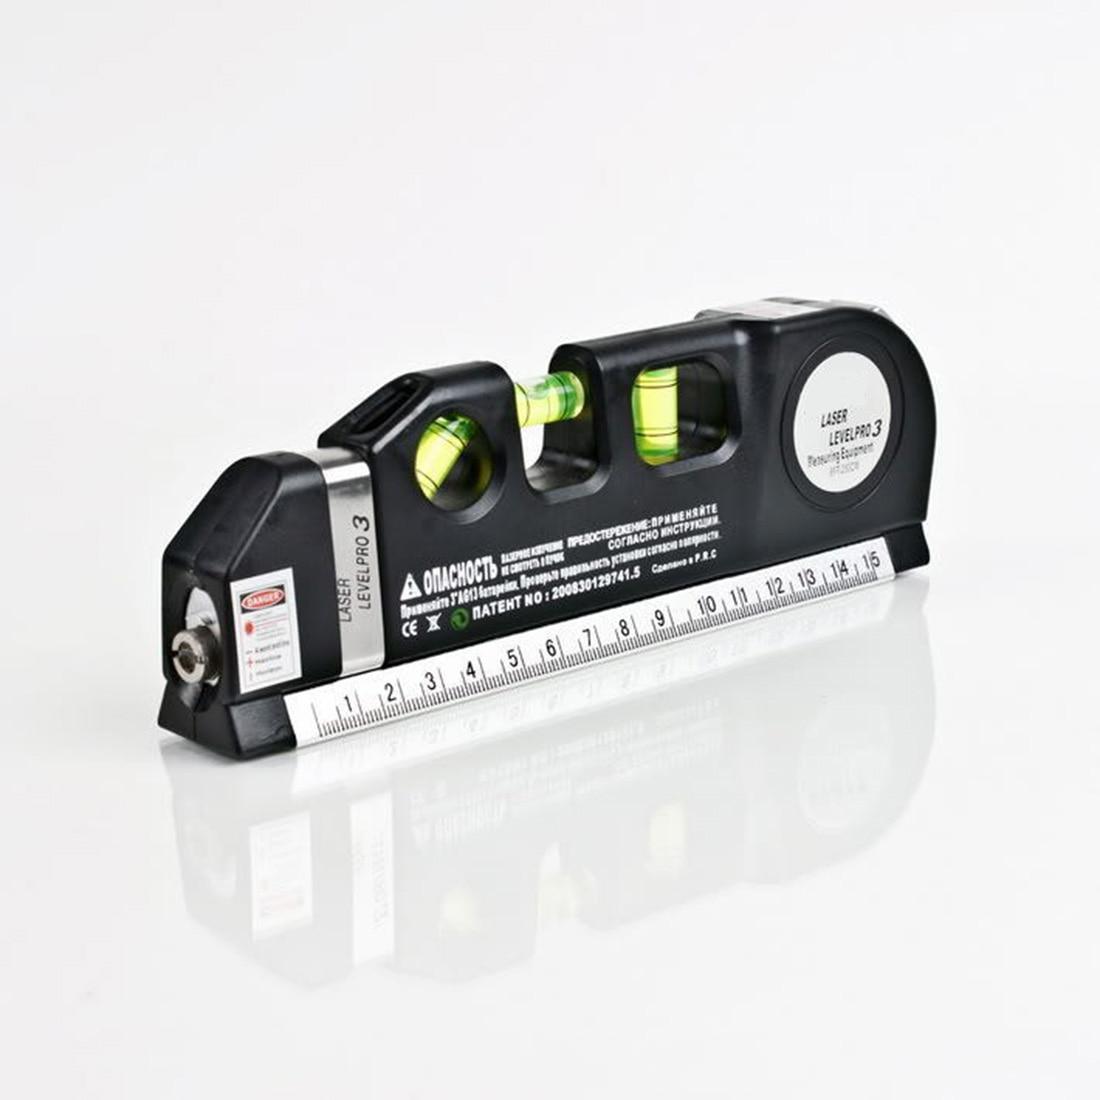 Good Multipurpose Level Laser Horizon Vertical Measure Tape 8FT Aligner Bubbles Ruler Tool for Hanging Pictures Laying Flooring